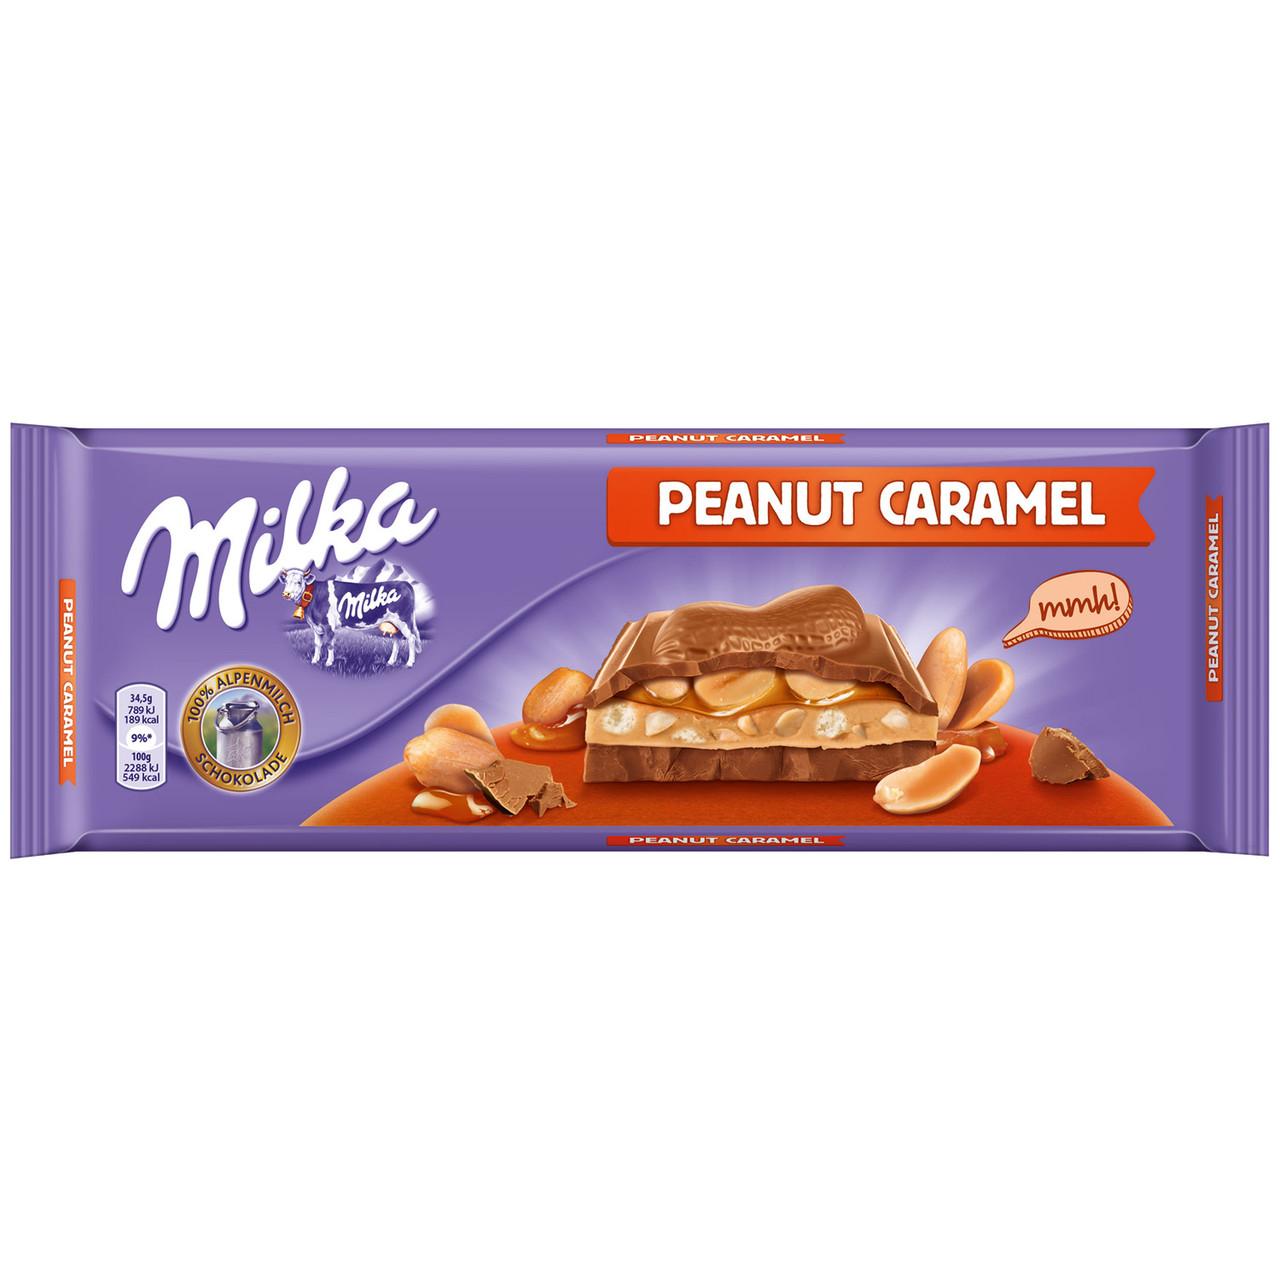 Шоколад Milka 300g Peanut Caramel